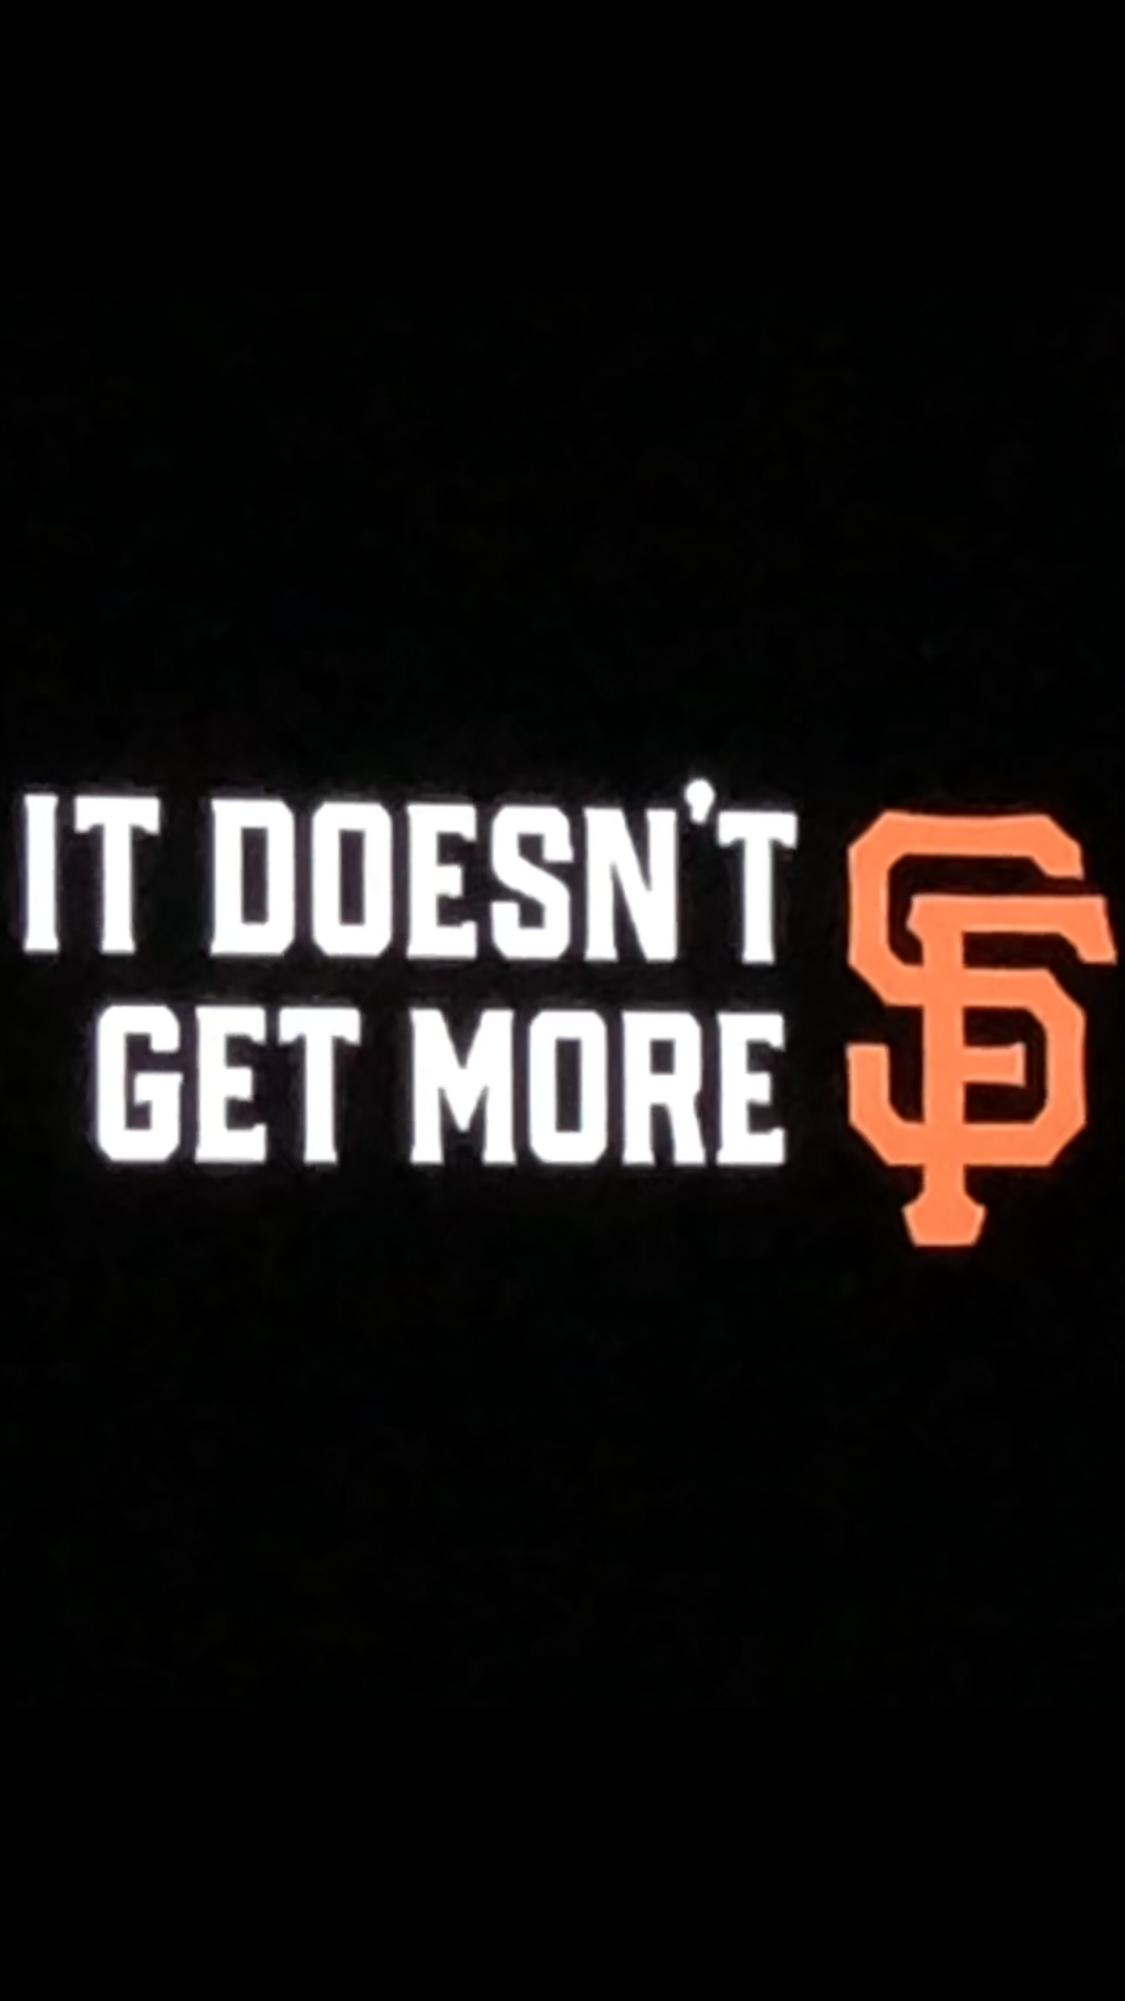 Pin by Chey on SF Giants Sf giants, Giants baseball, San